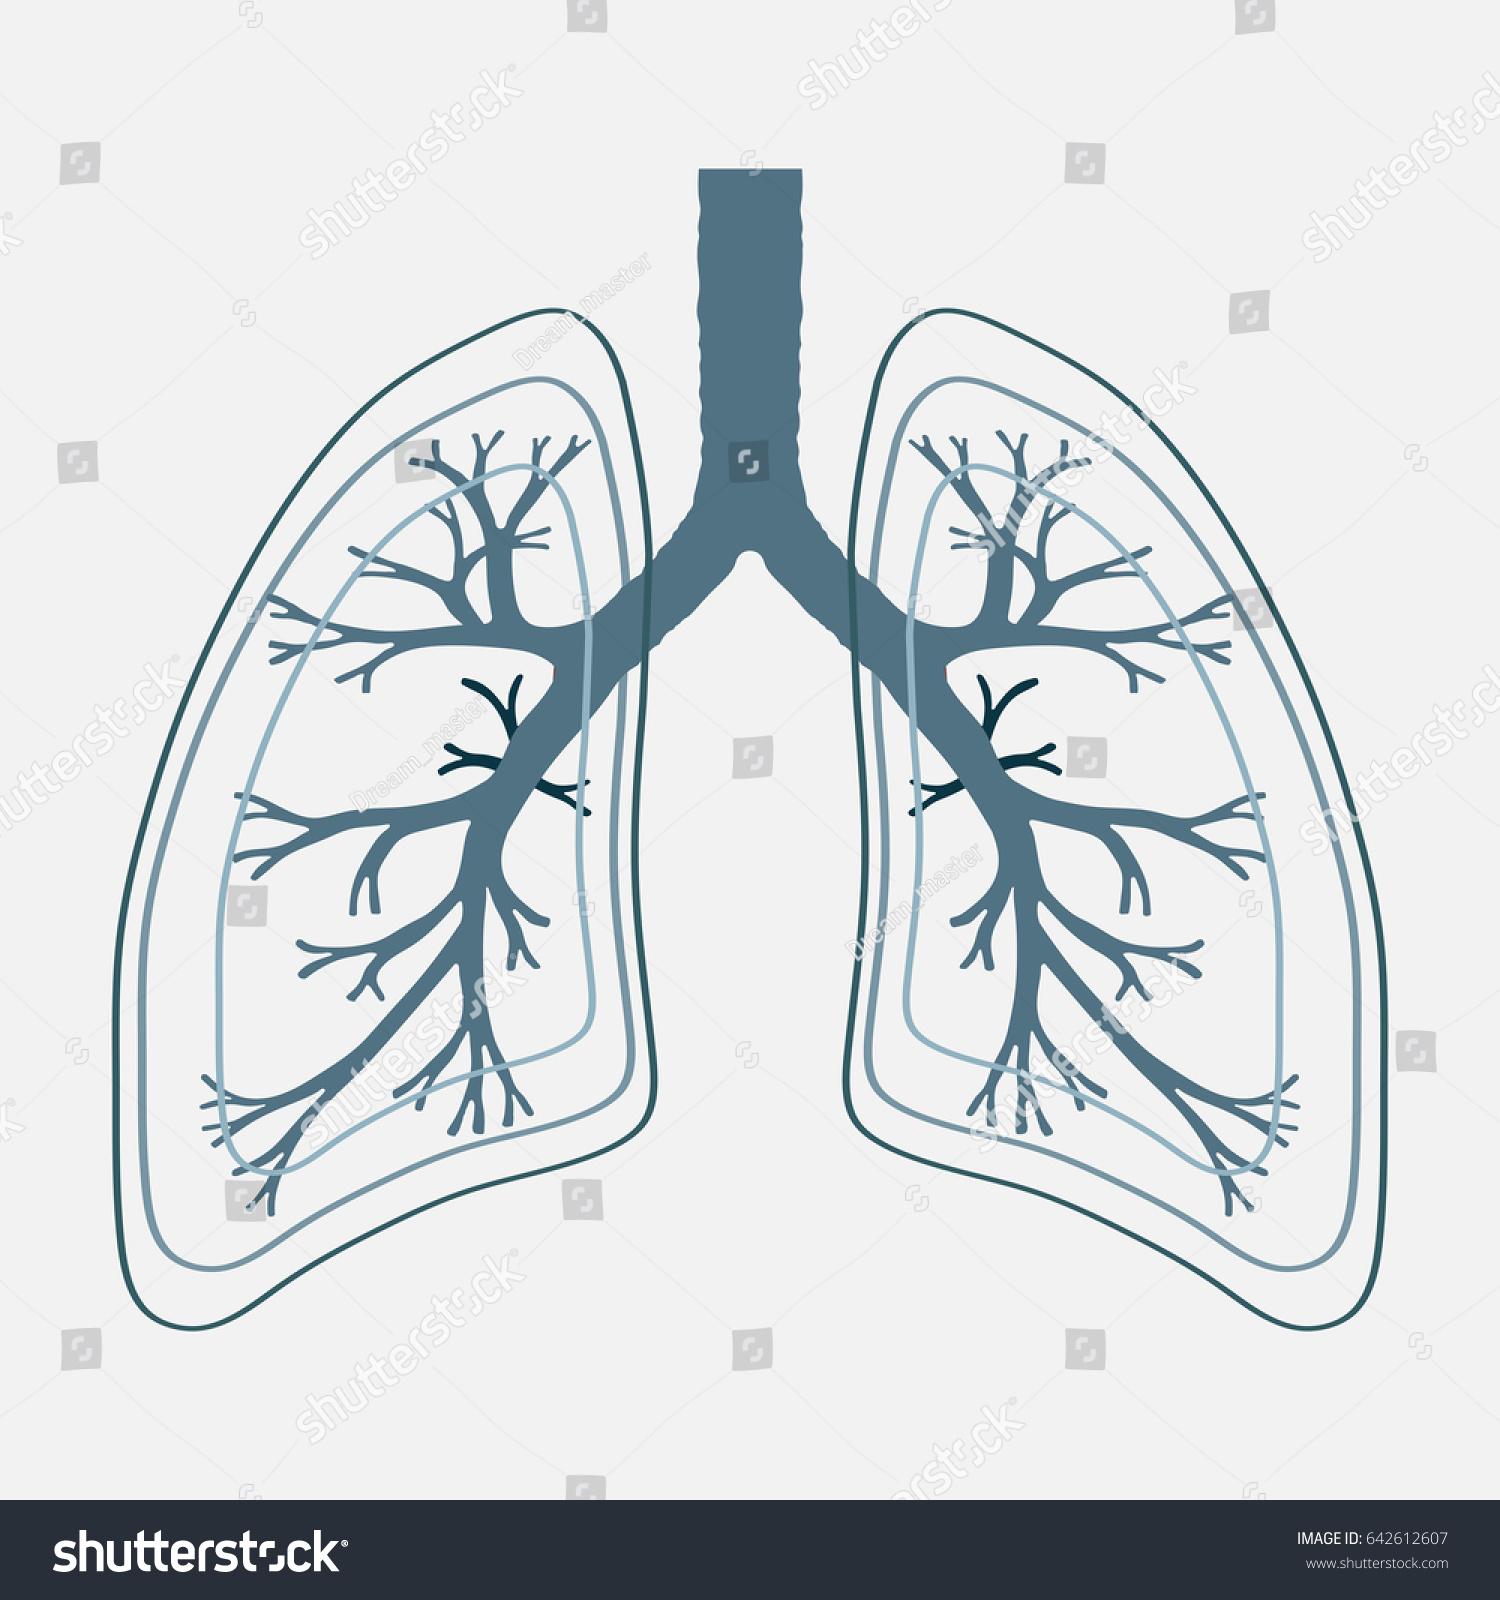 Human Lung Anatomy Illustration Illness Respiratory Stock ...